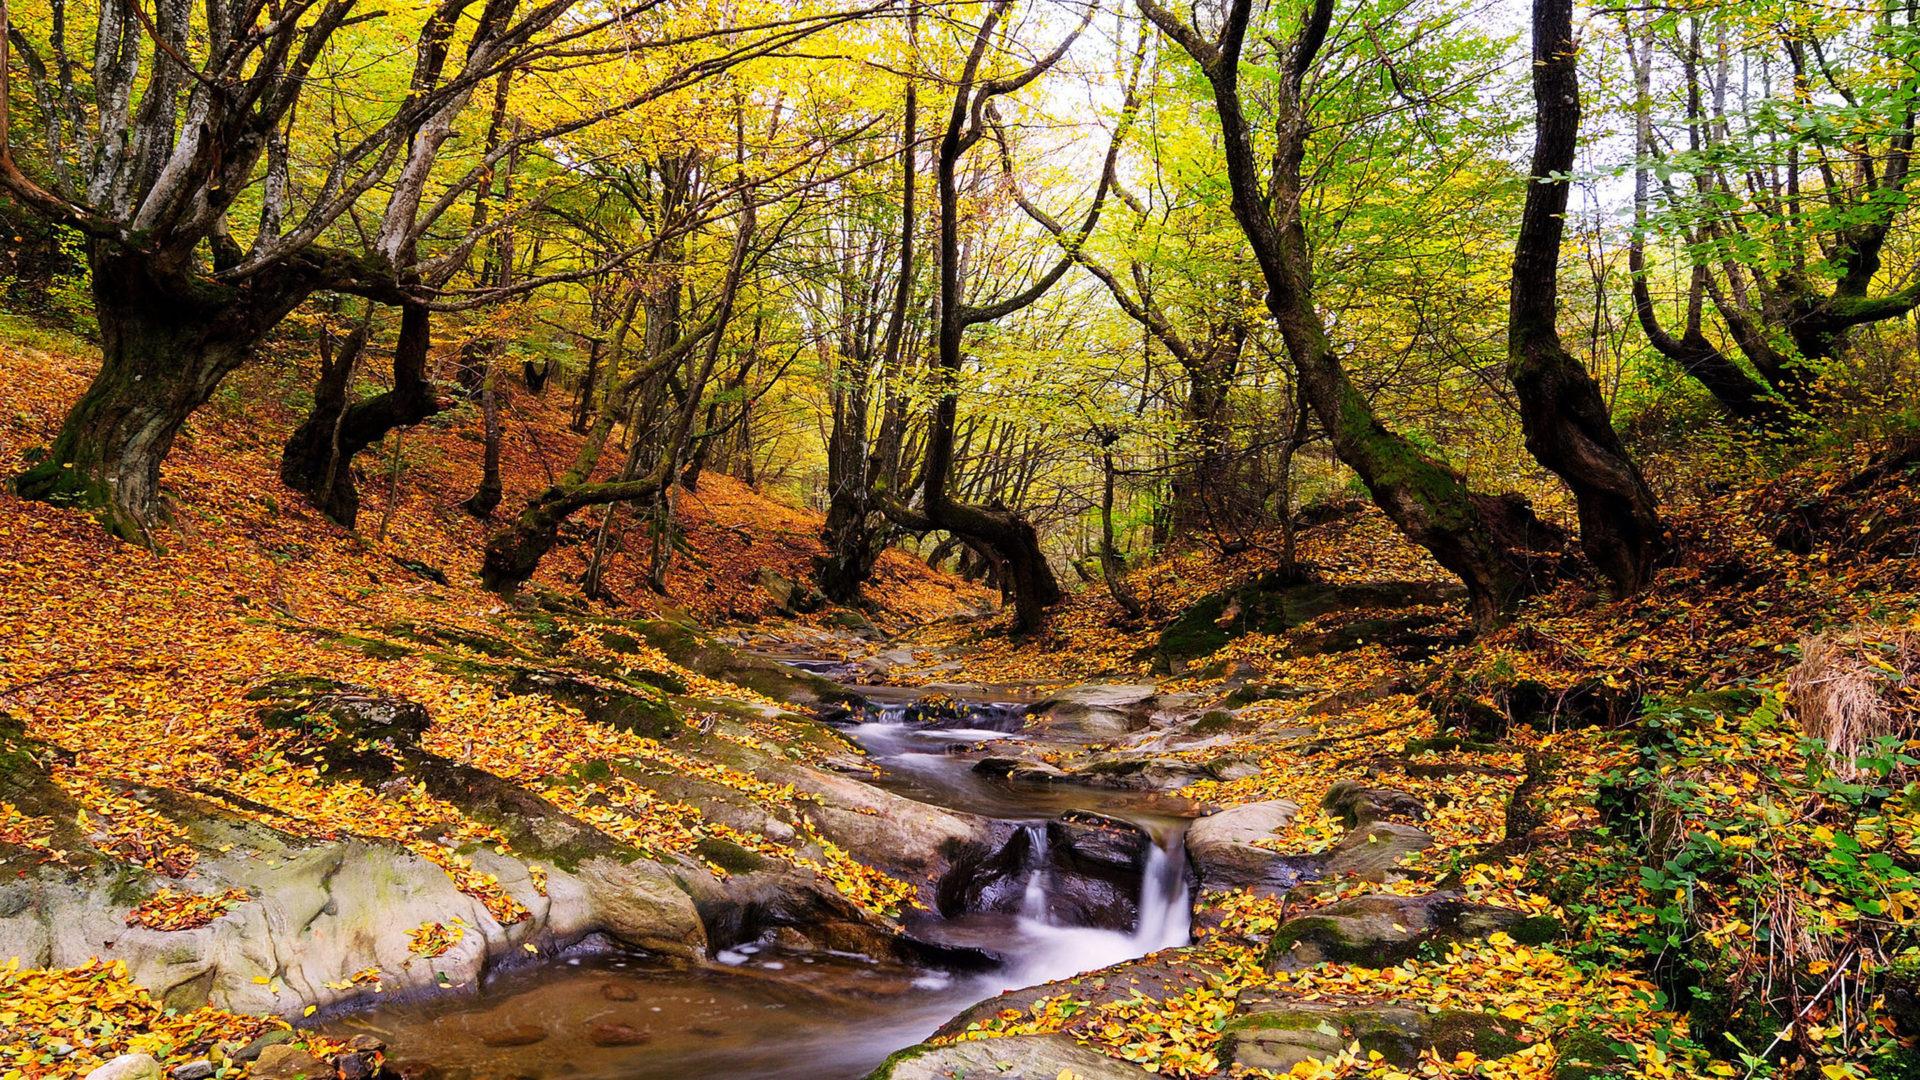 Free Computer Wallpaper Fall Leaves Wonderful Autumn Landscape Forest Trees Stream Fallen